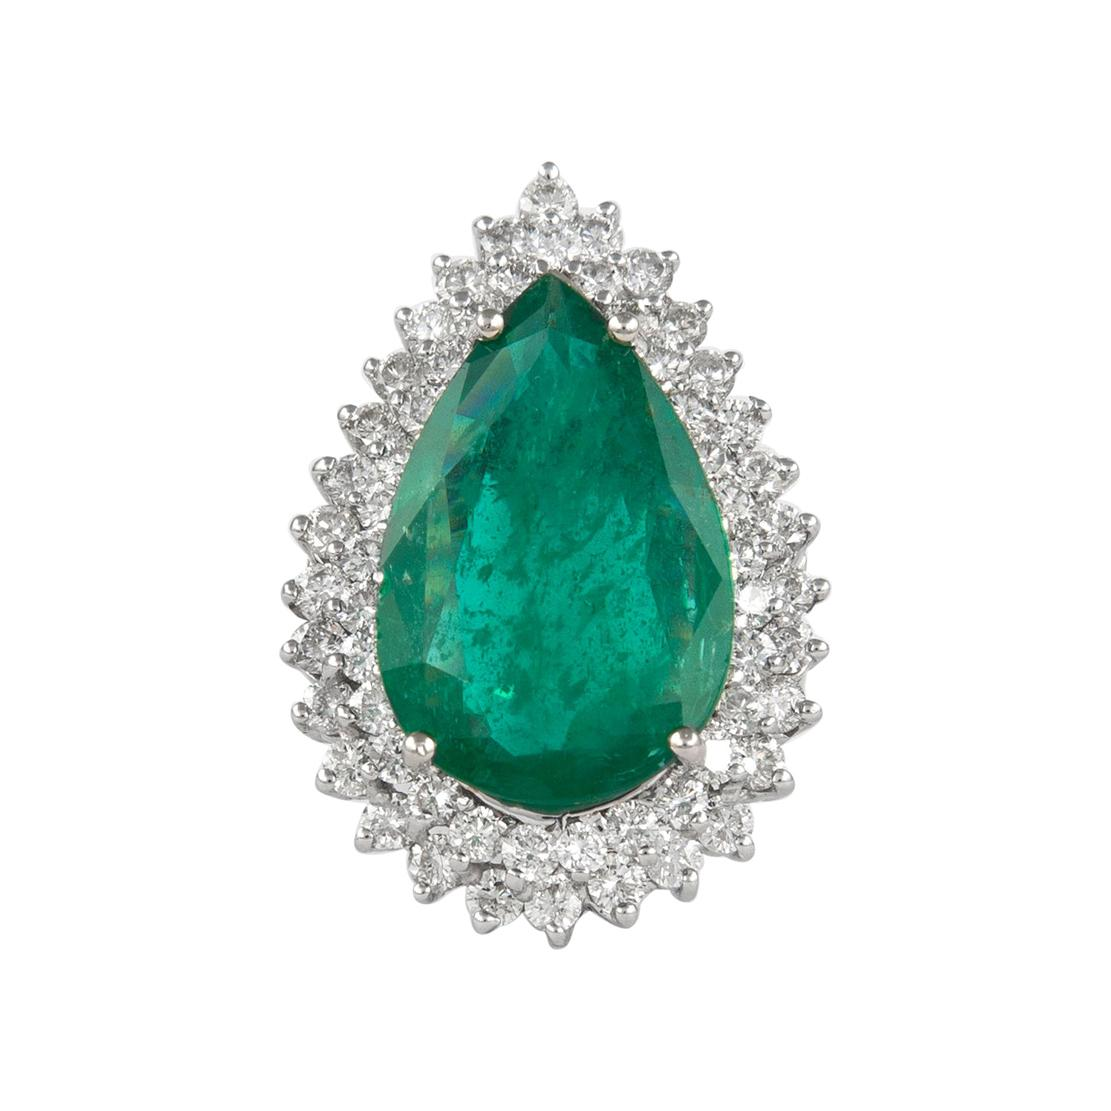 8.11 Carat Emerald with Double Diamond Halo Ring 18 Karat White Gold